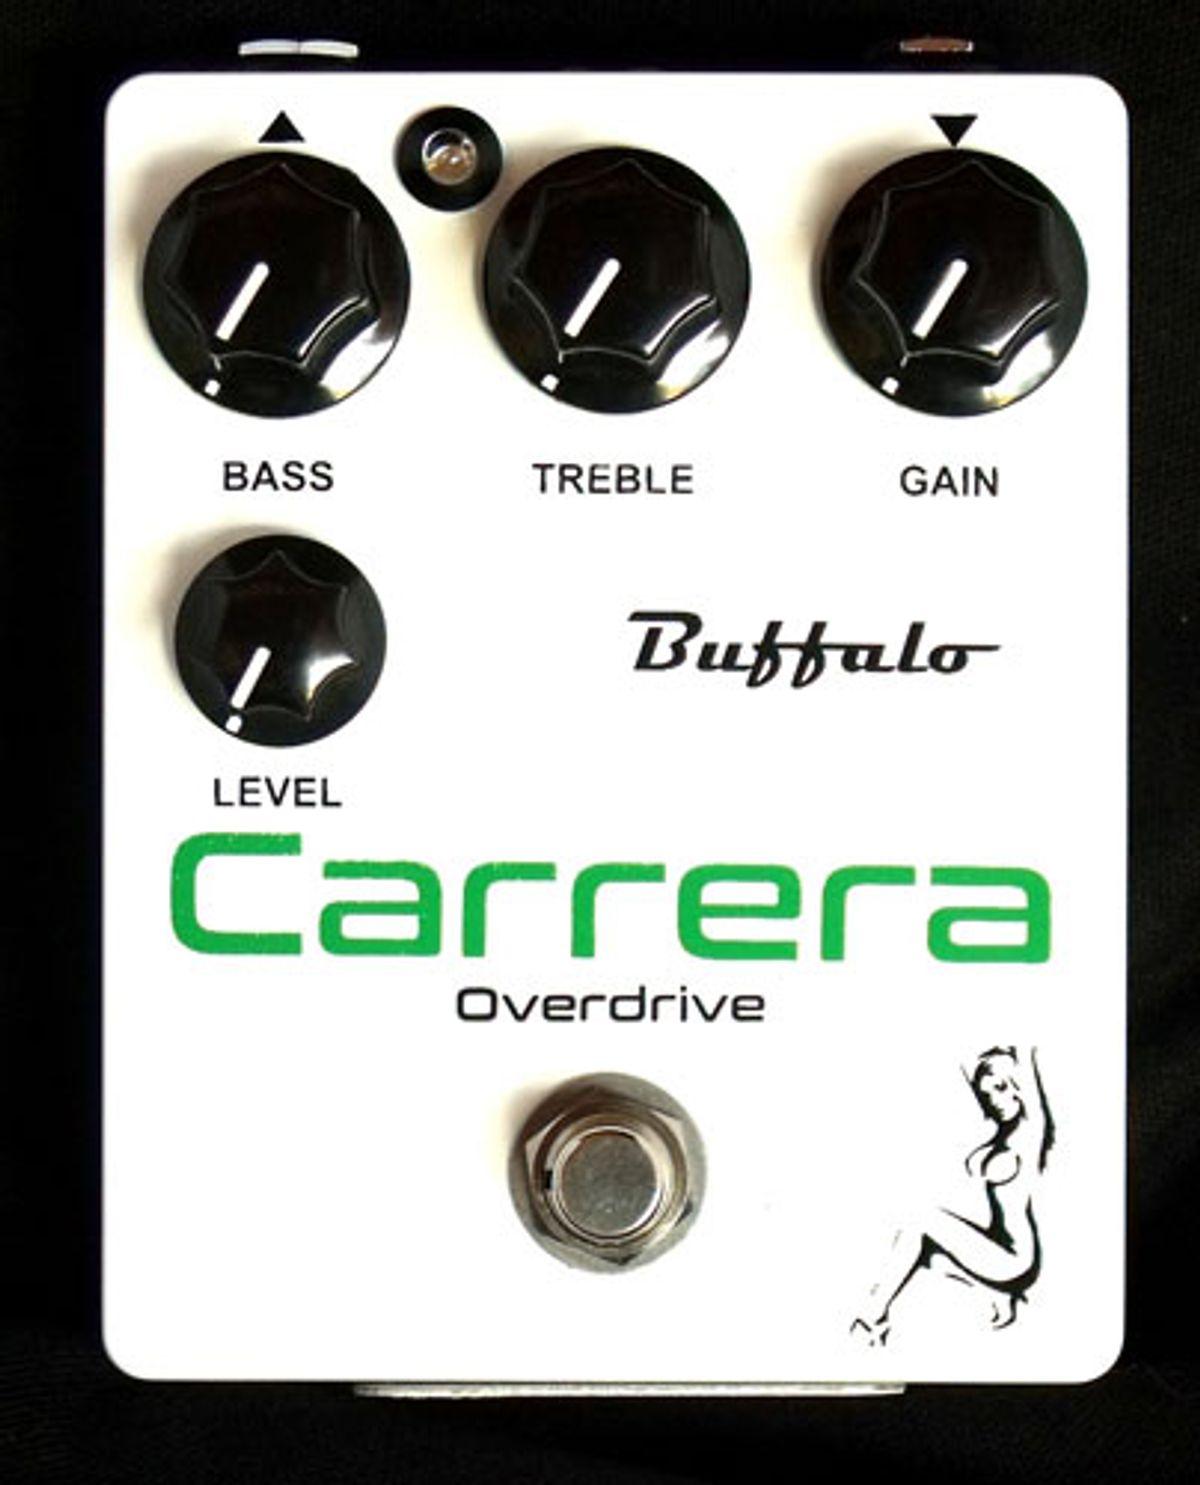 Buffalo FX Releases the Carrera Overdrive